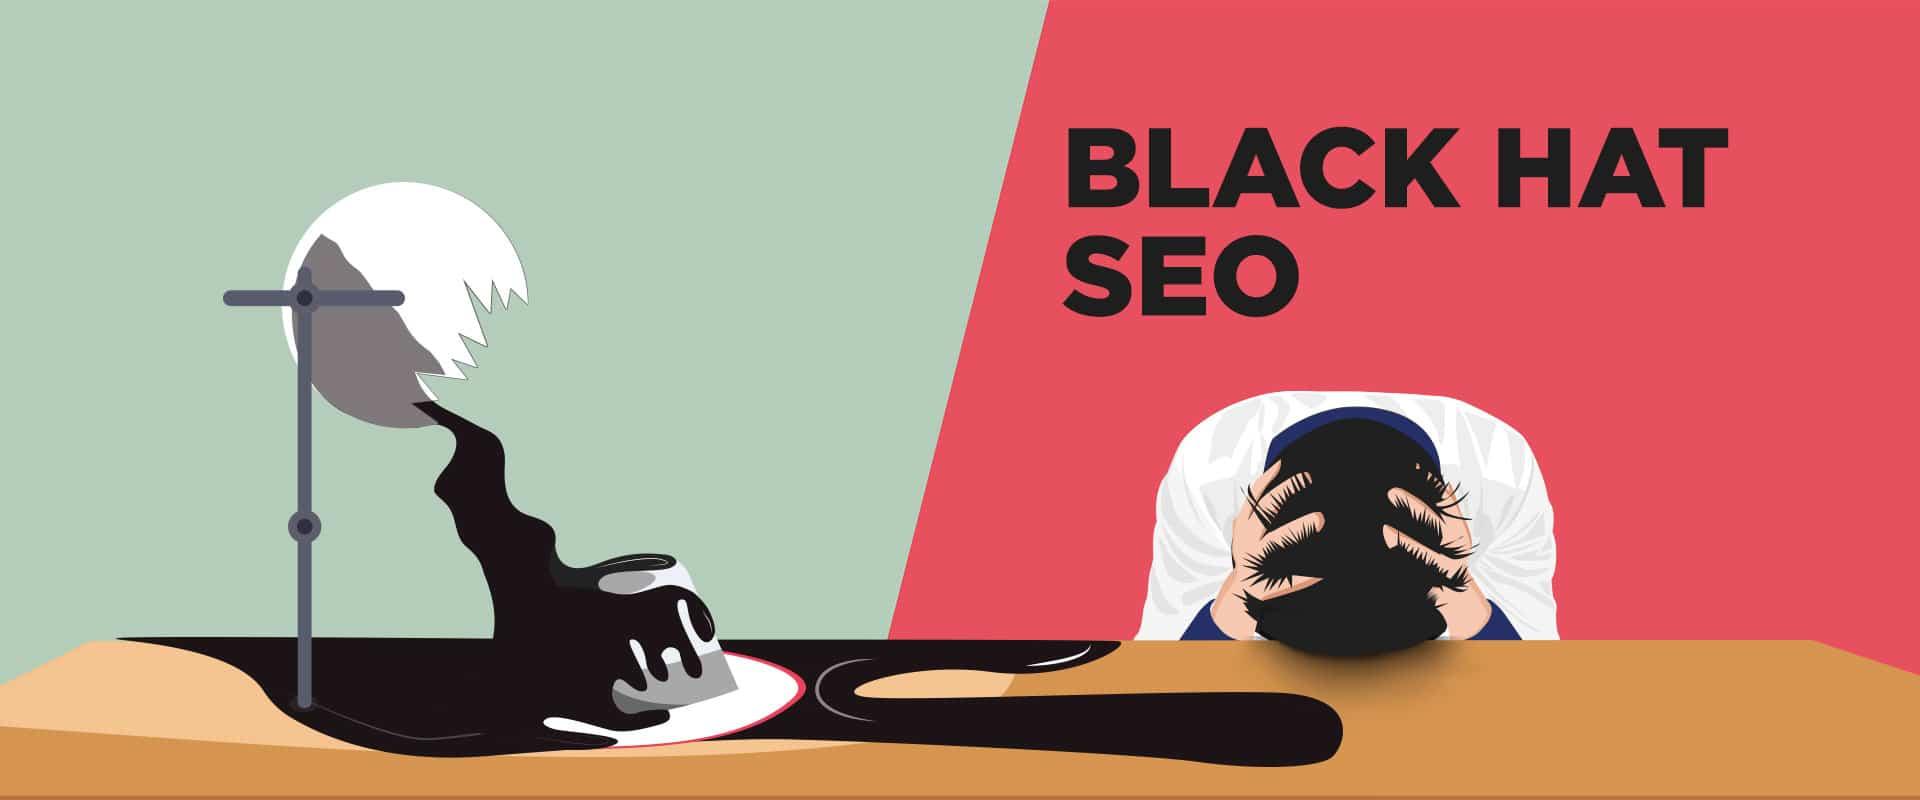 black-hat-seo-black-hat-seo-techniques-black-hat-seo-works